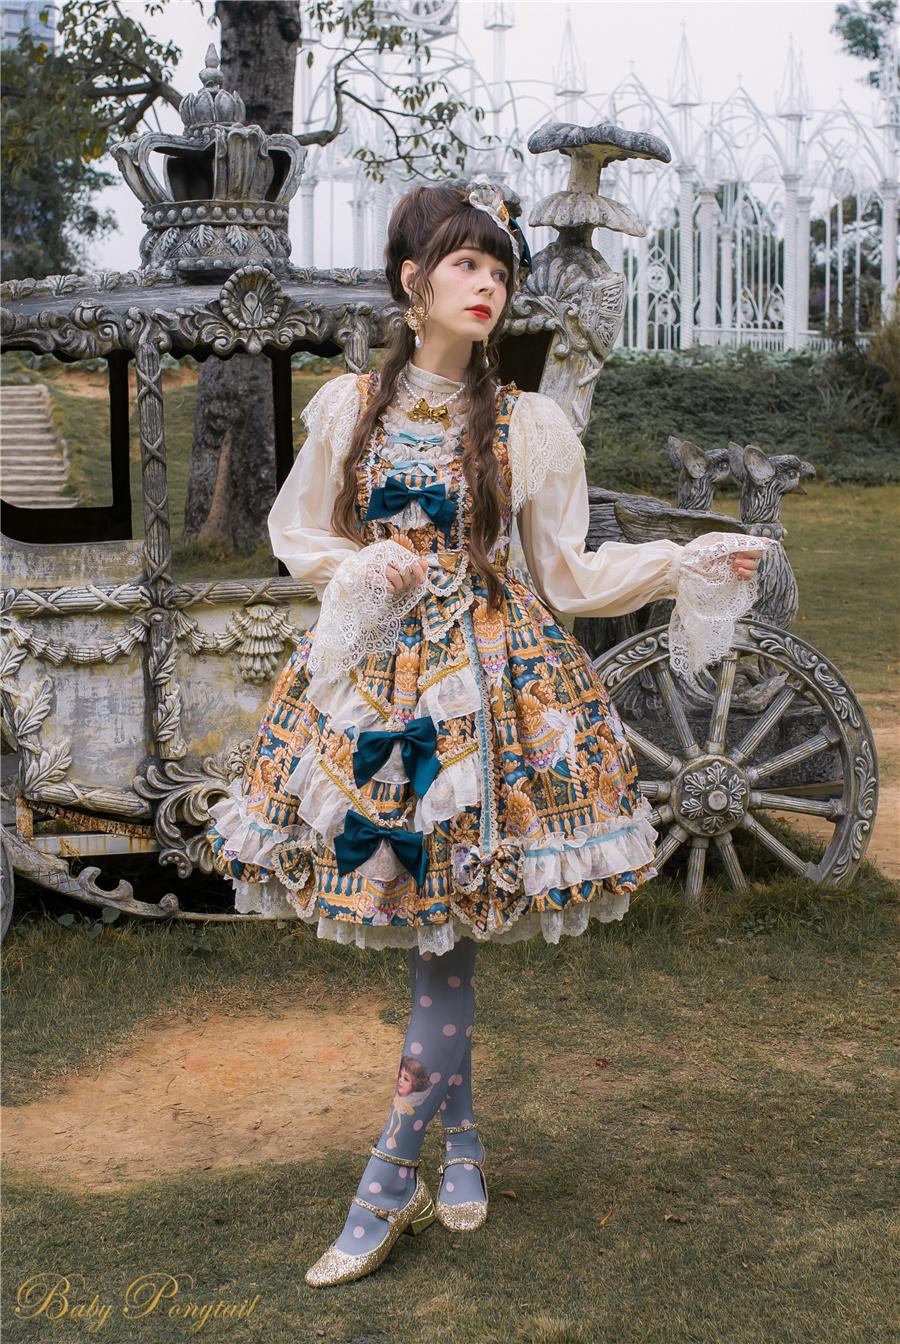 Babyponytail_Model_JSK_Tiel Present Angel_Claudia_2_11.jpg